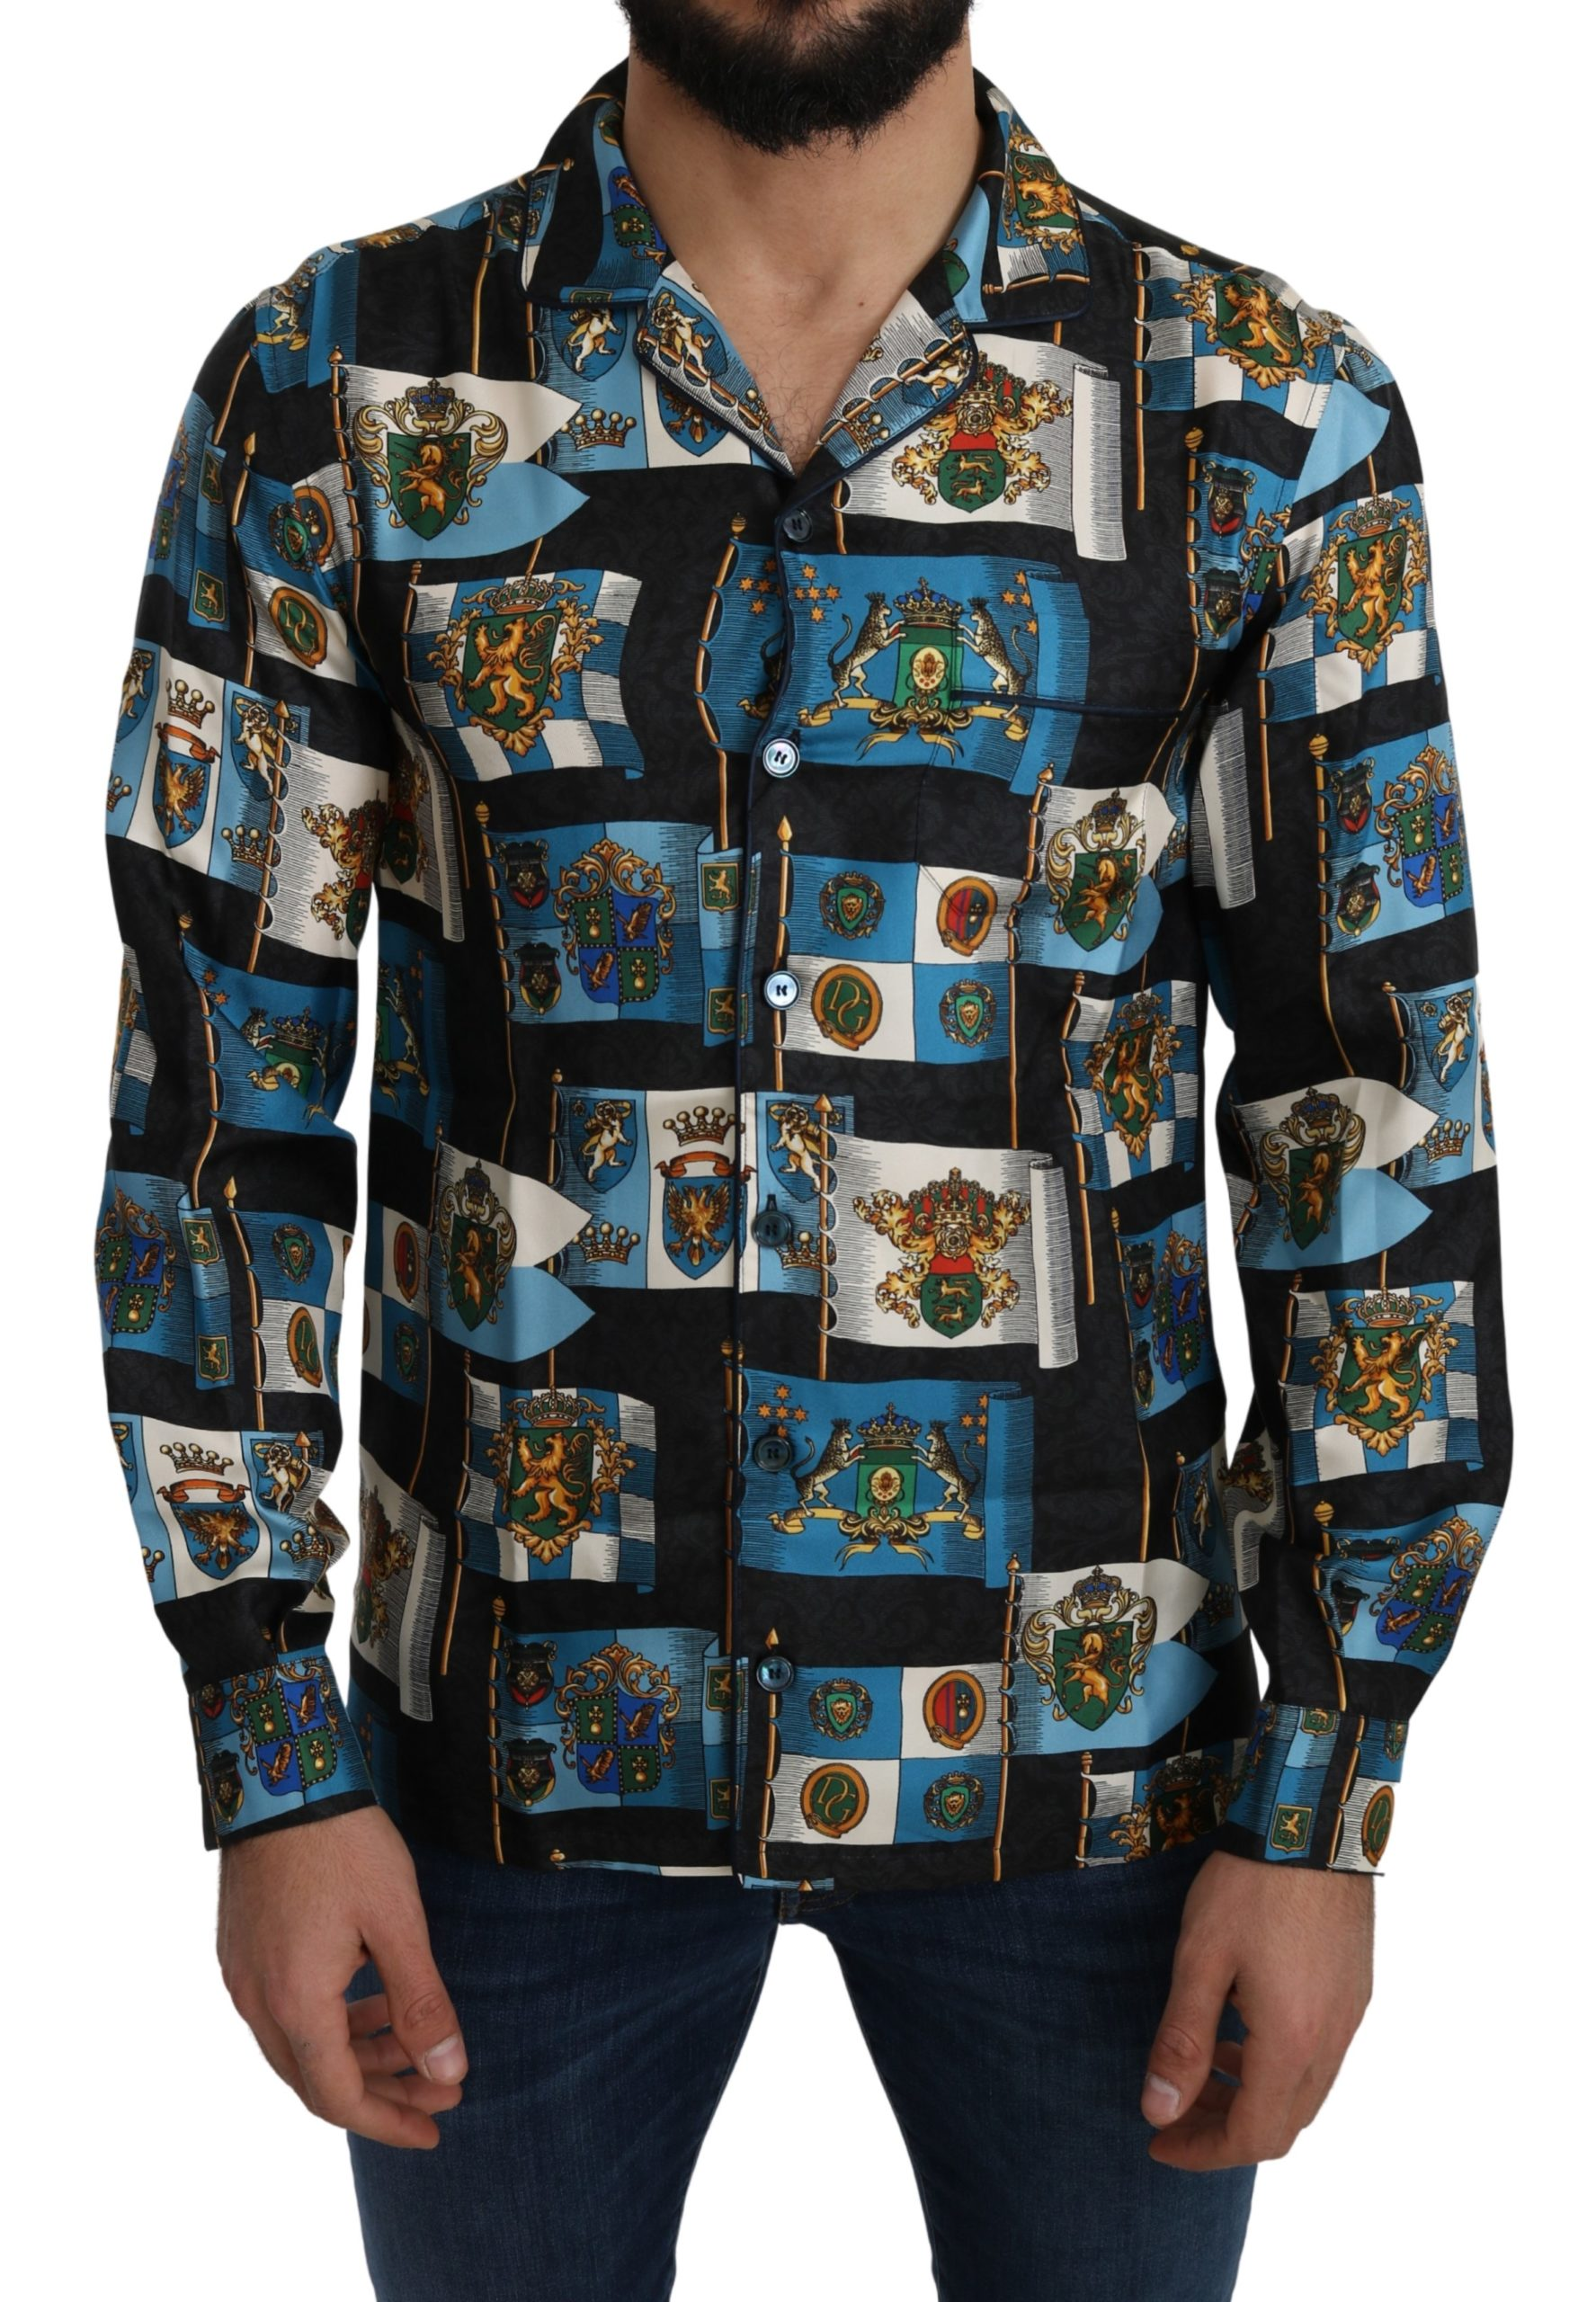 Dolce & Gabbana Men's Silk Coat of Arms Casual Shirt Blue TSH5209 - IT42   XL